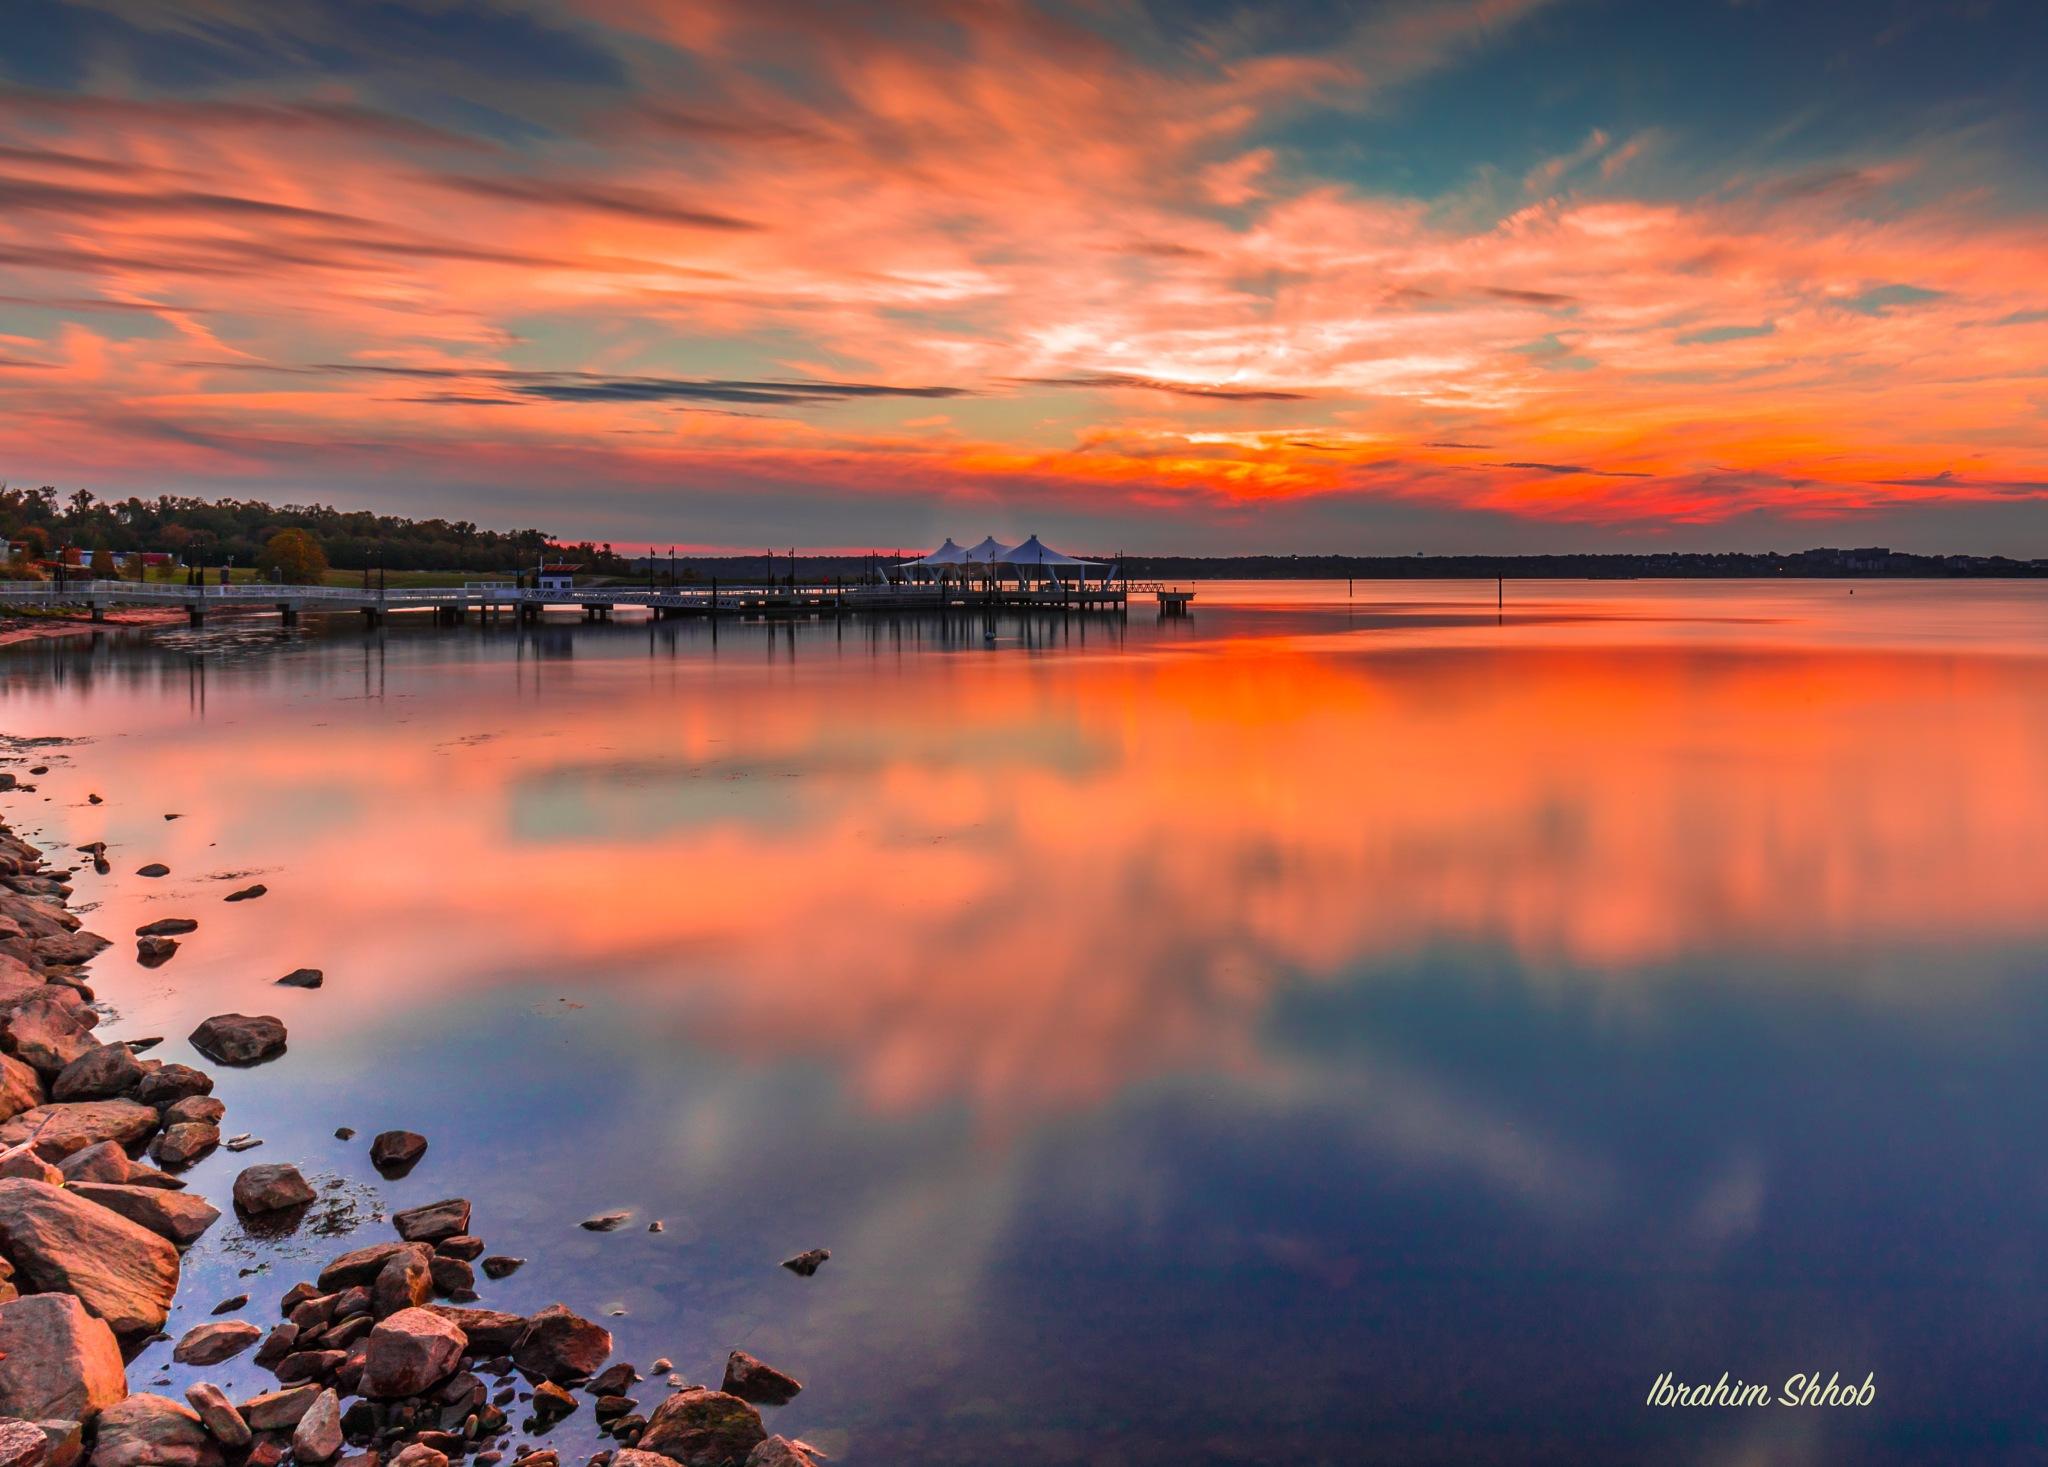 National Harbor by Ibrahim shhob